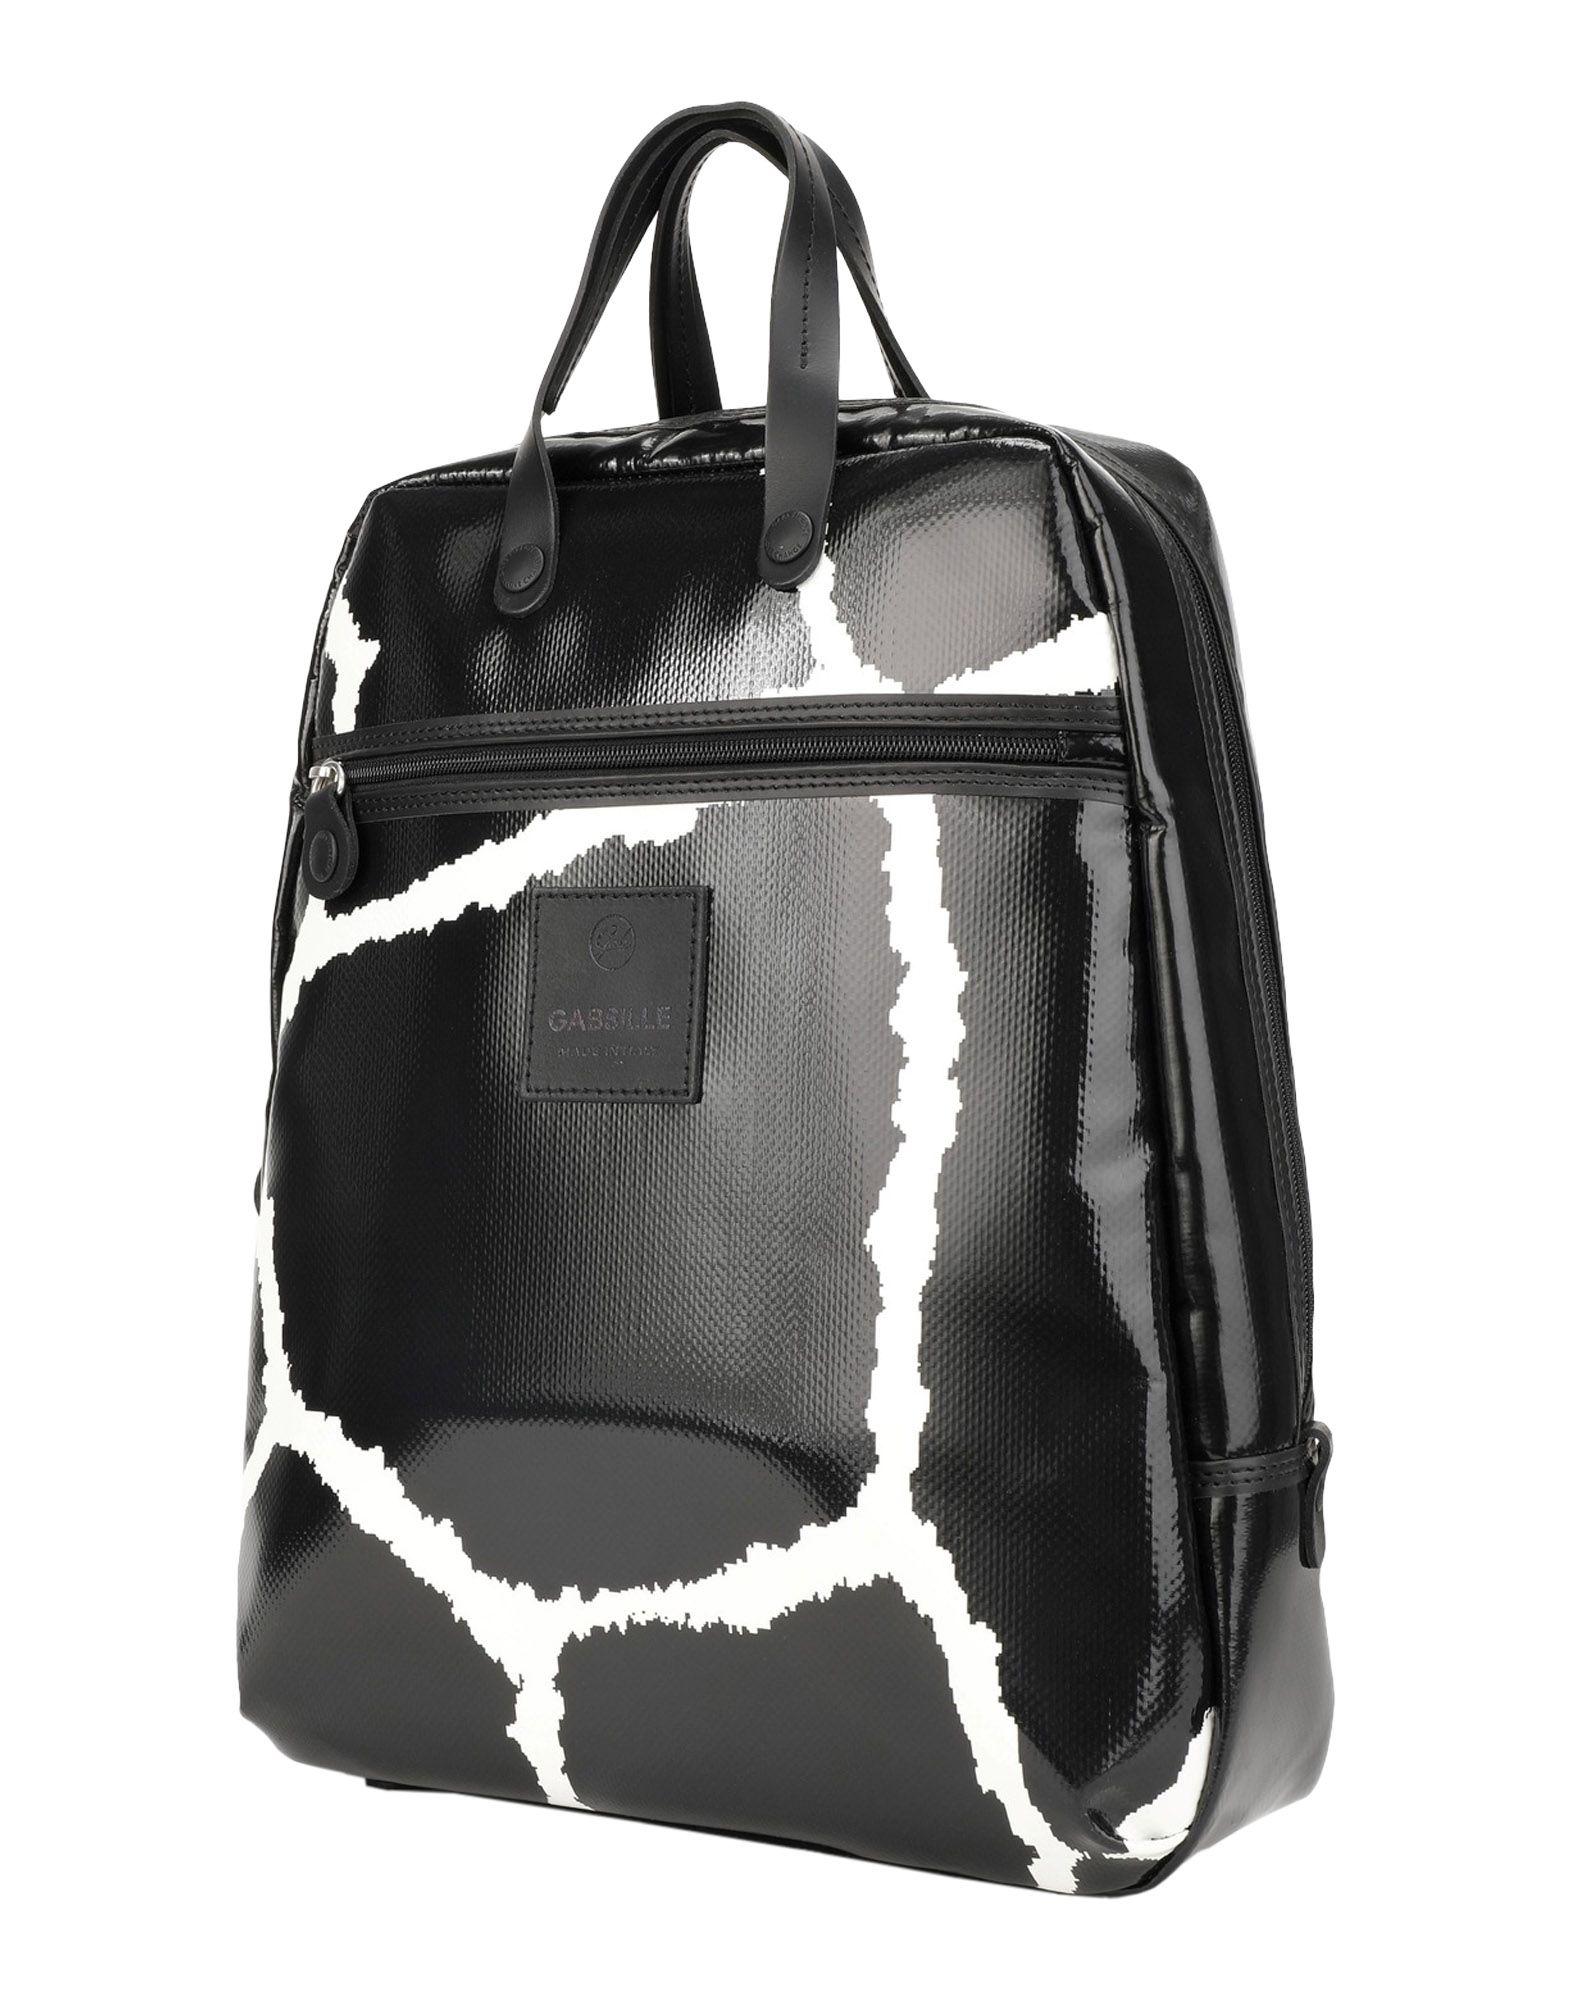 GABS Backpack & Fanny Pack in Black